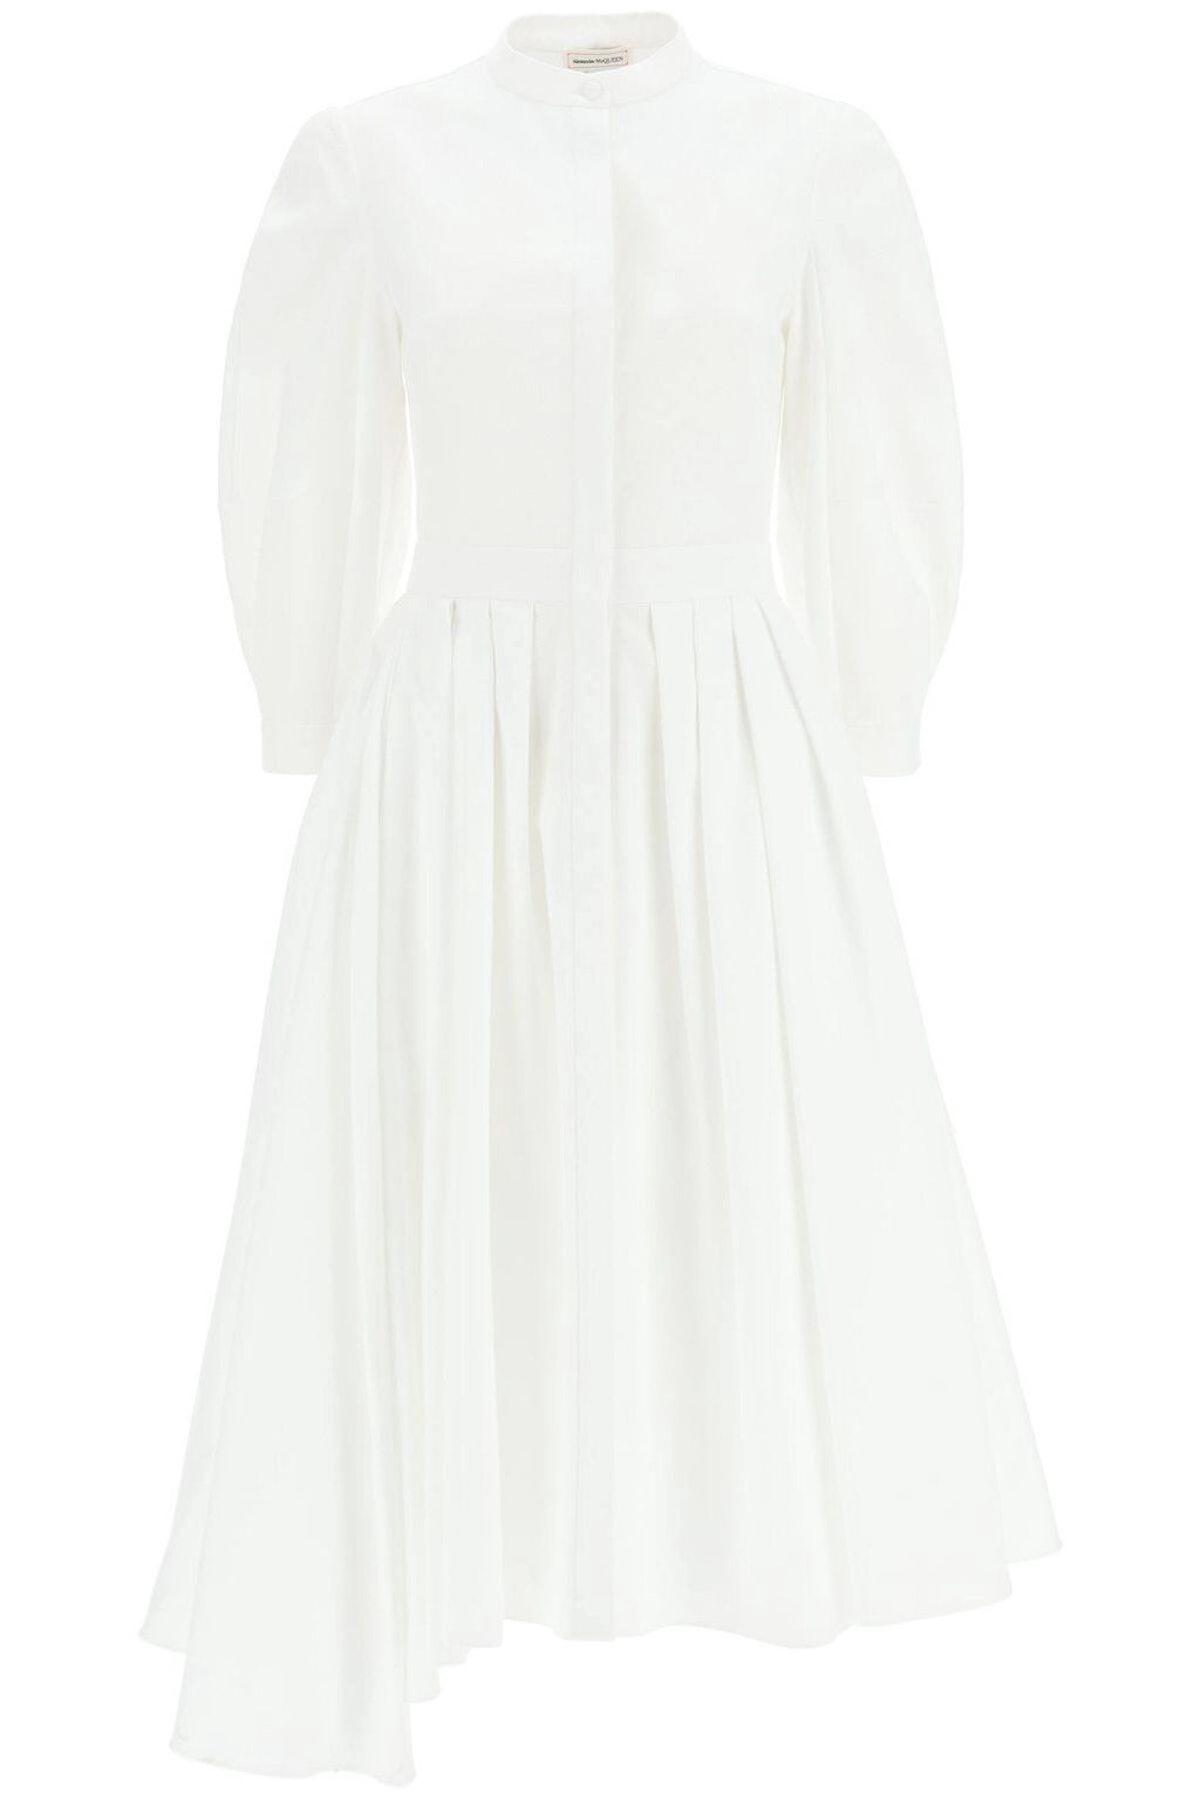 Alexander Mcqueen Asymmetrical Dress In Cotton Piquet: image 1